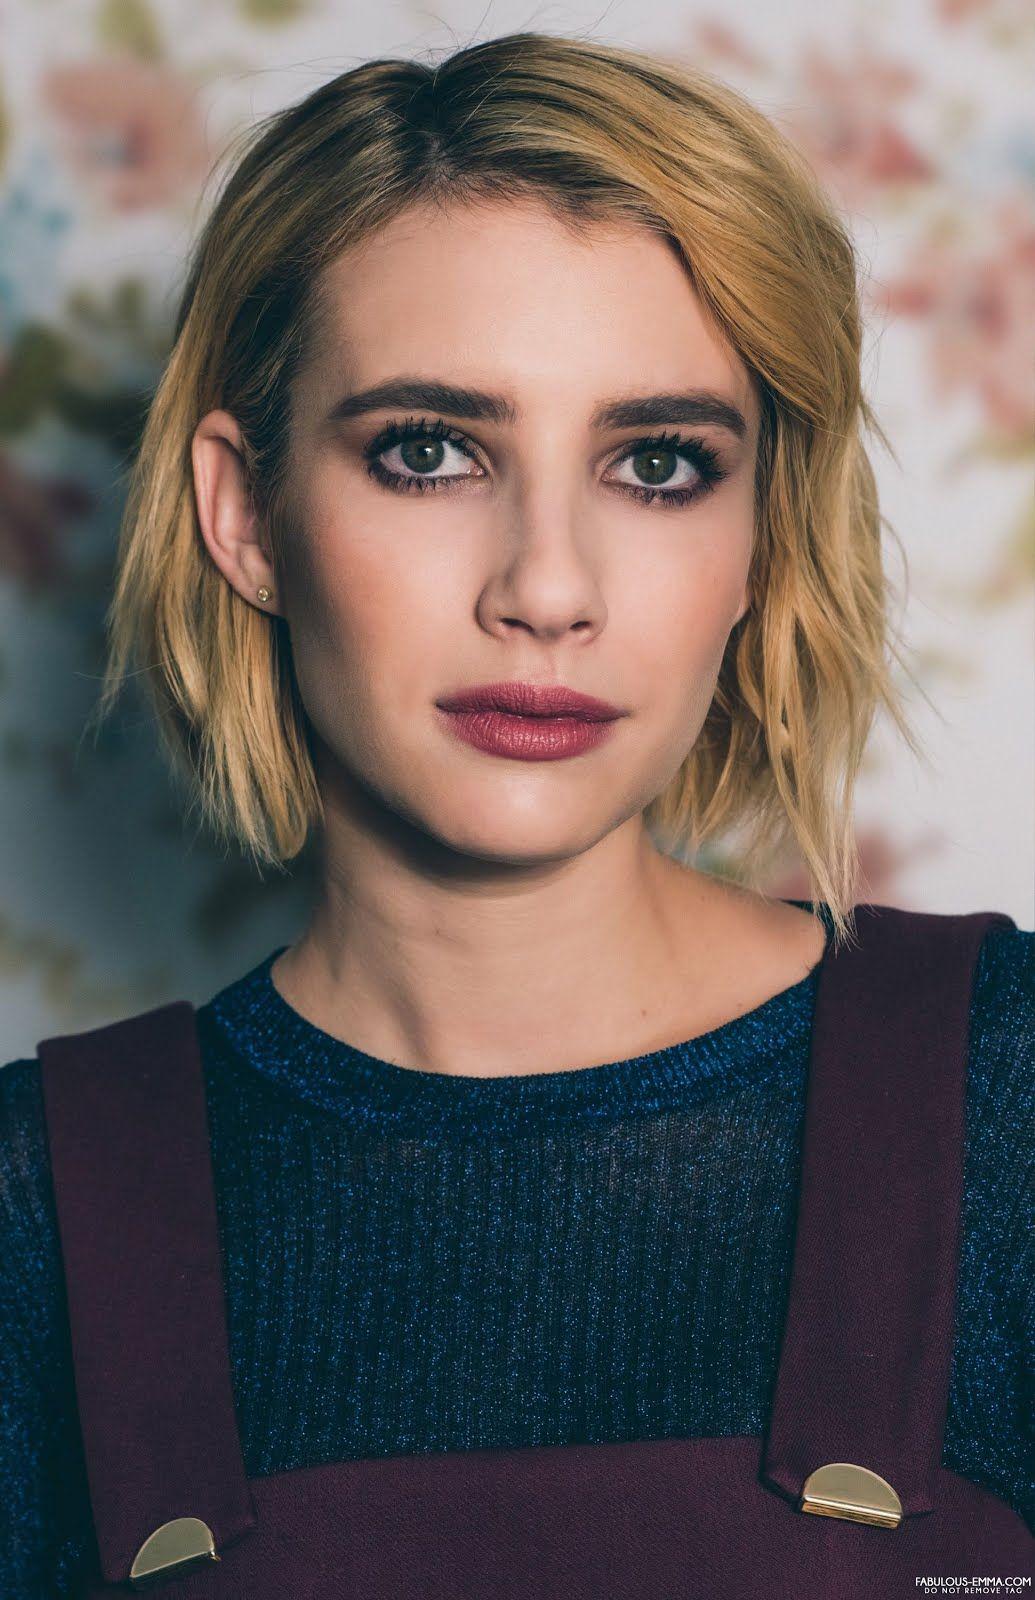 Top 10 Hottest Female Teen Celebrities in 2019 Sexiest